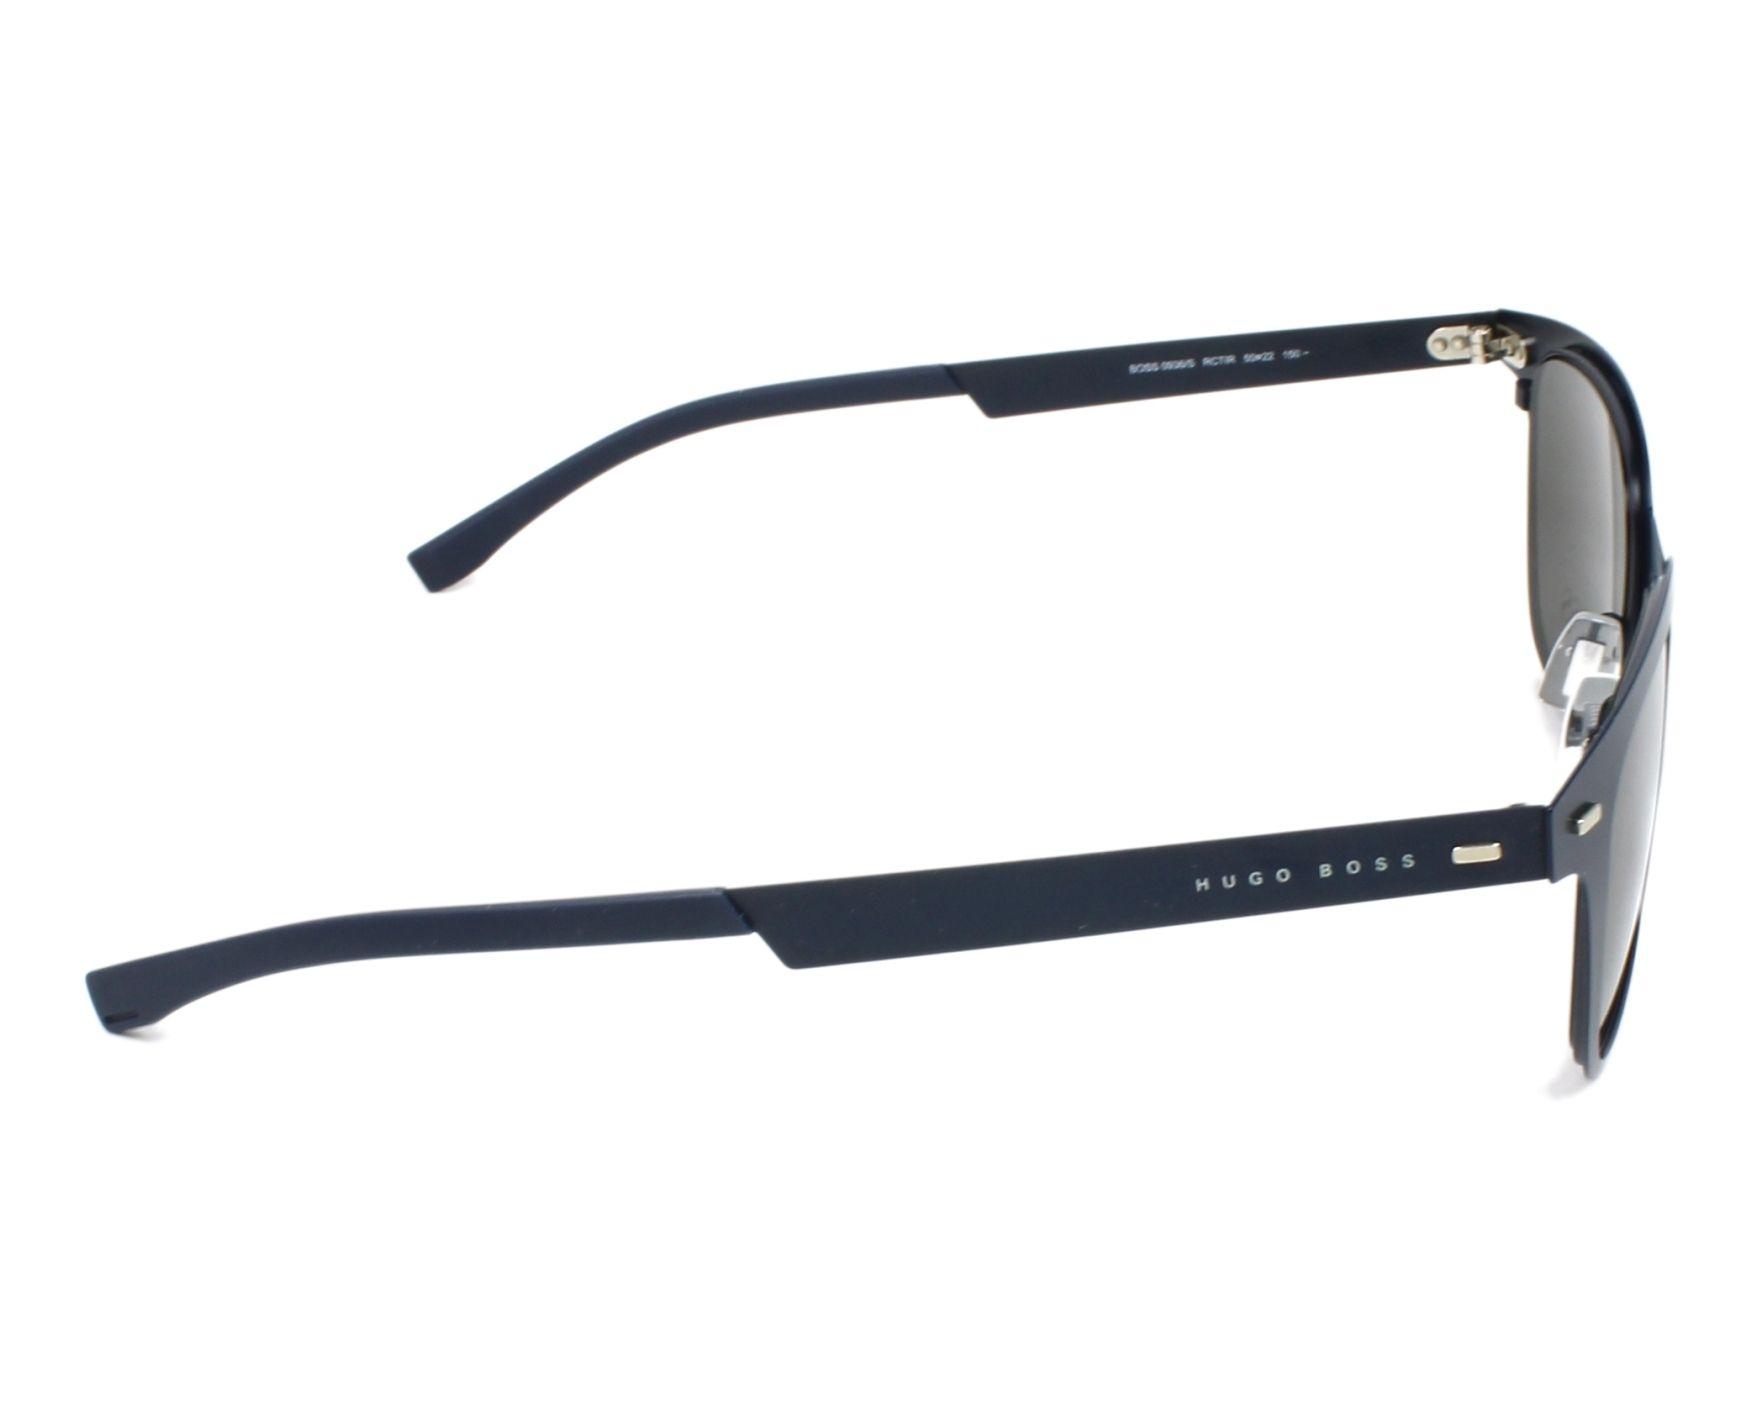 Hugo Boss 0936/S RCT IR Größe 50 z0jBlaTs